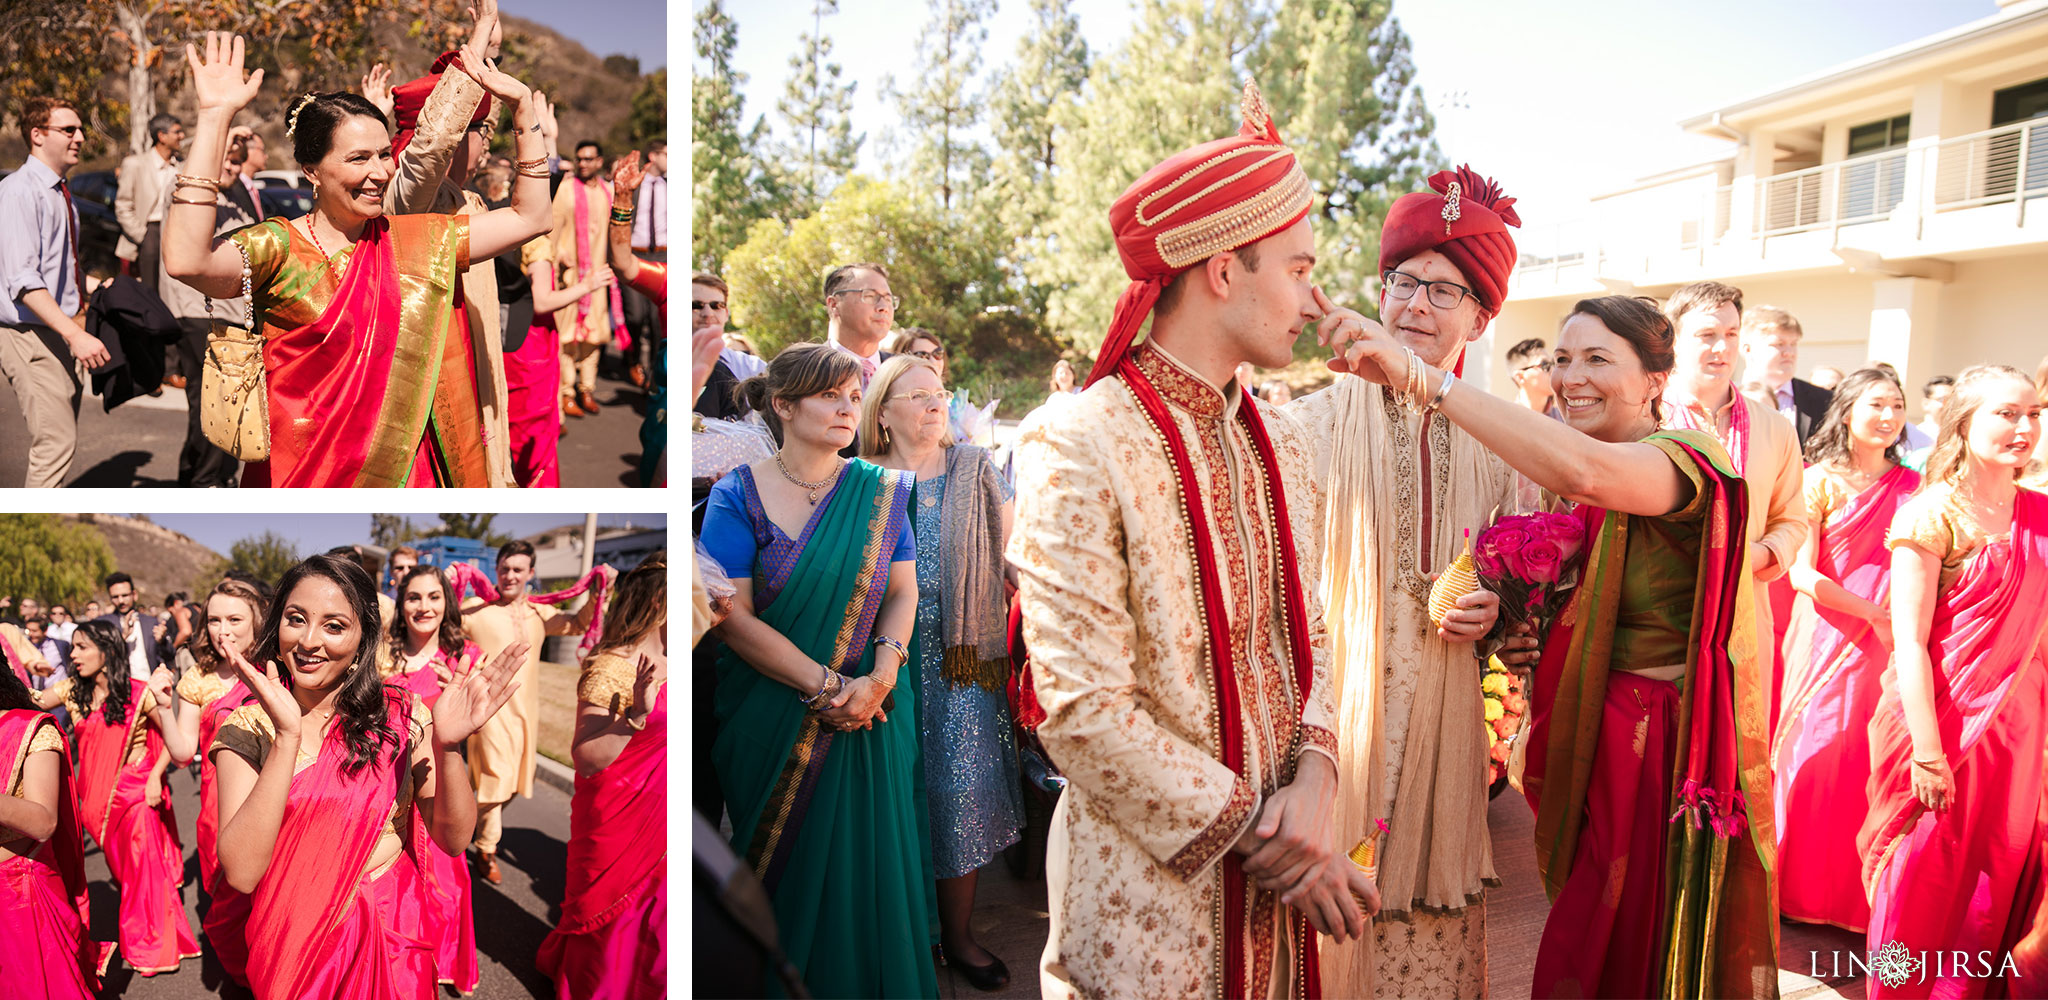 16 Black Gold Golf Course Yorba Linda Indian Wedding Photography